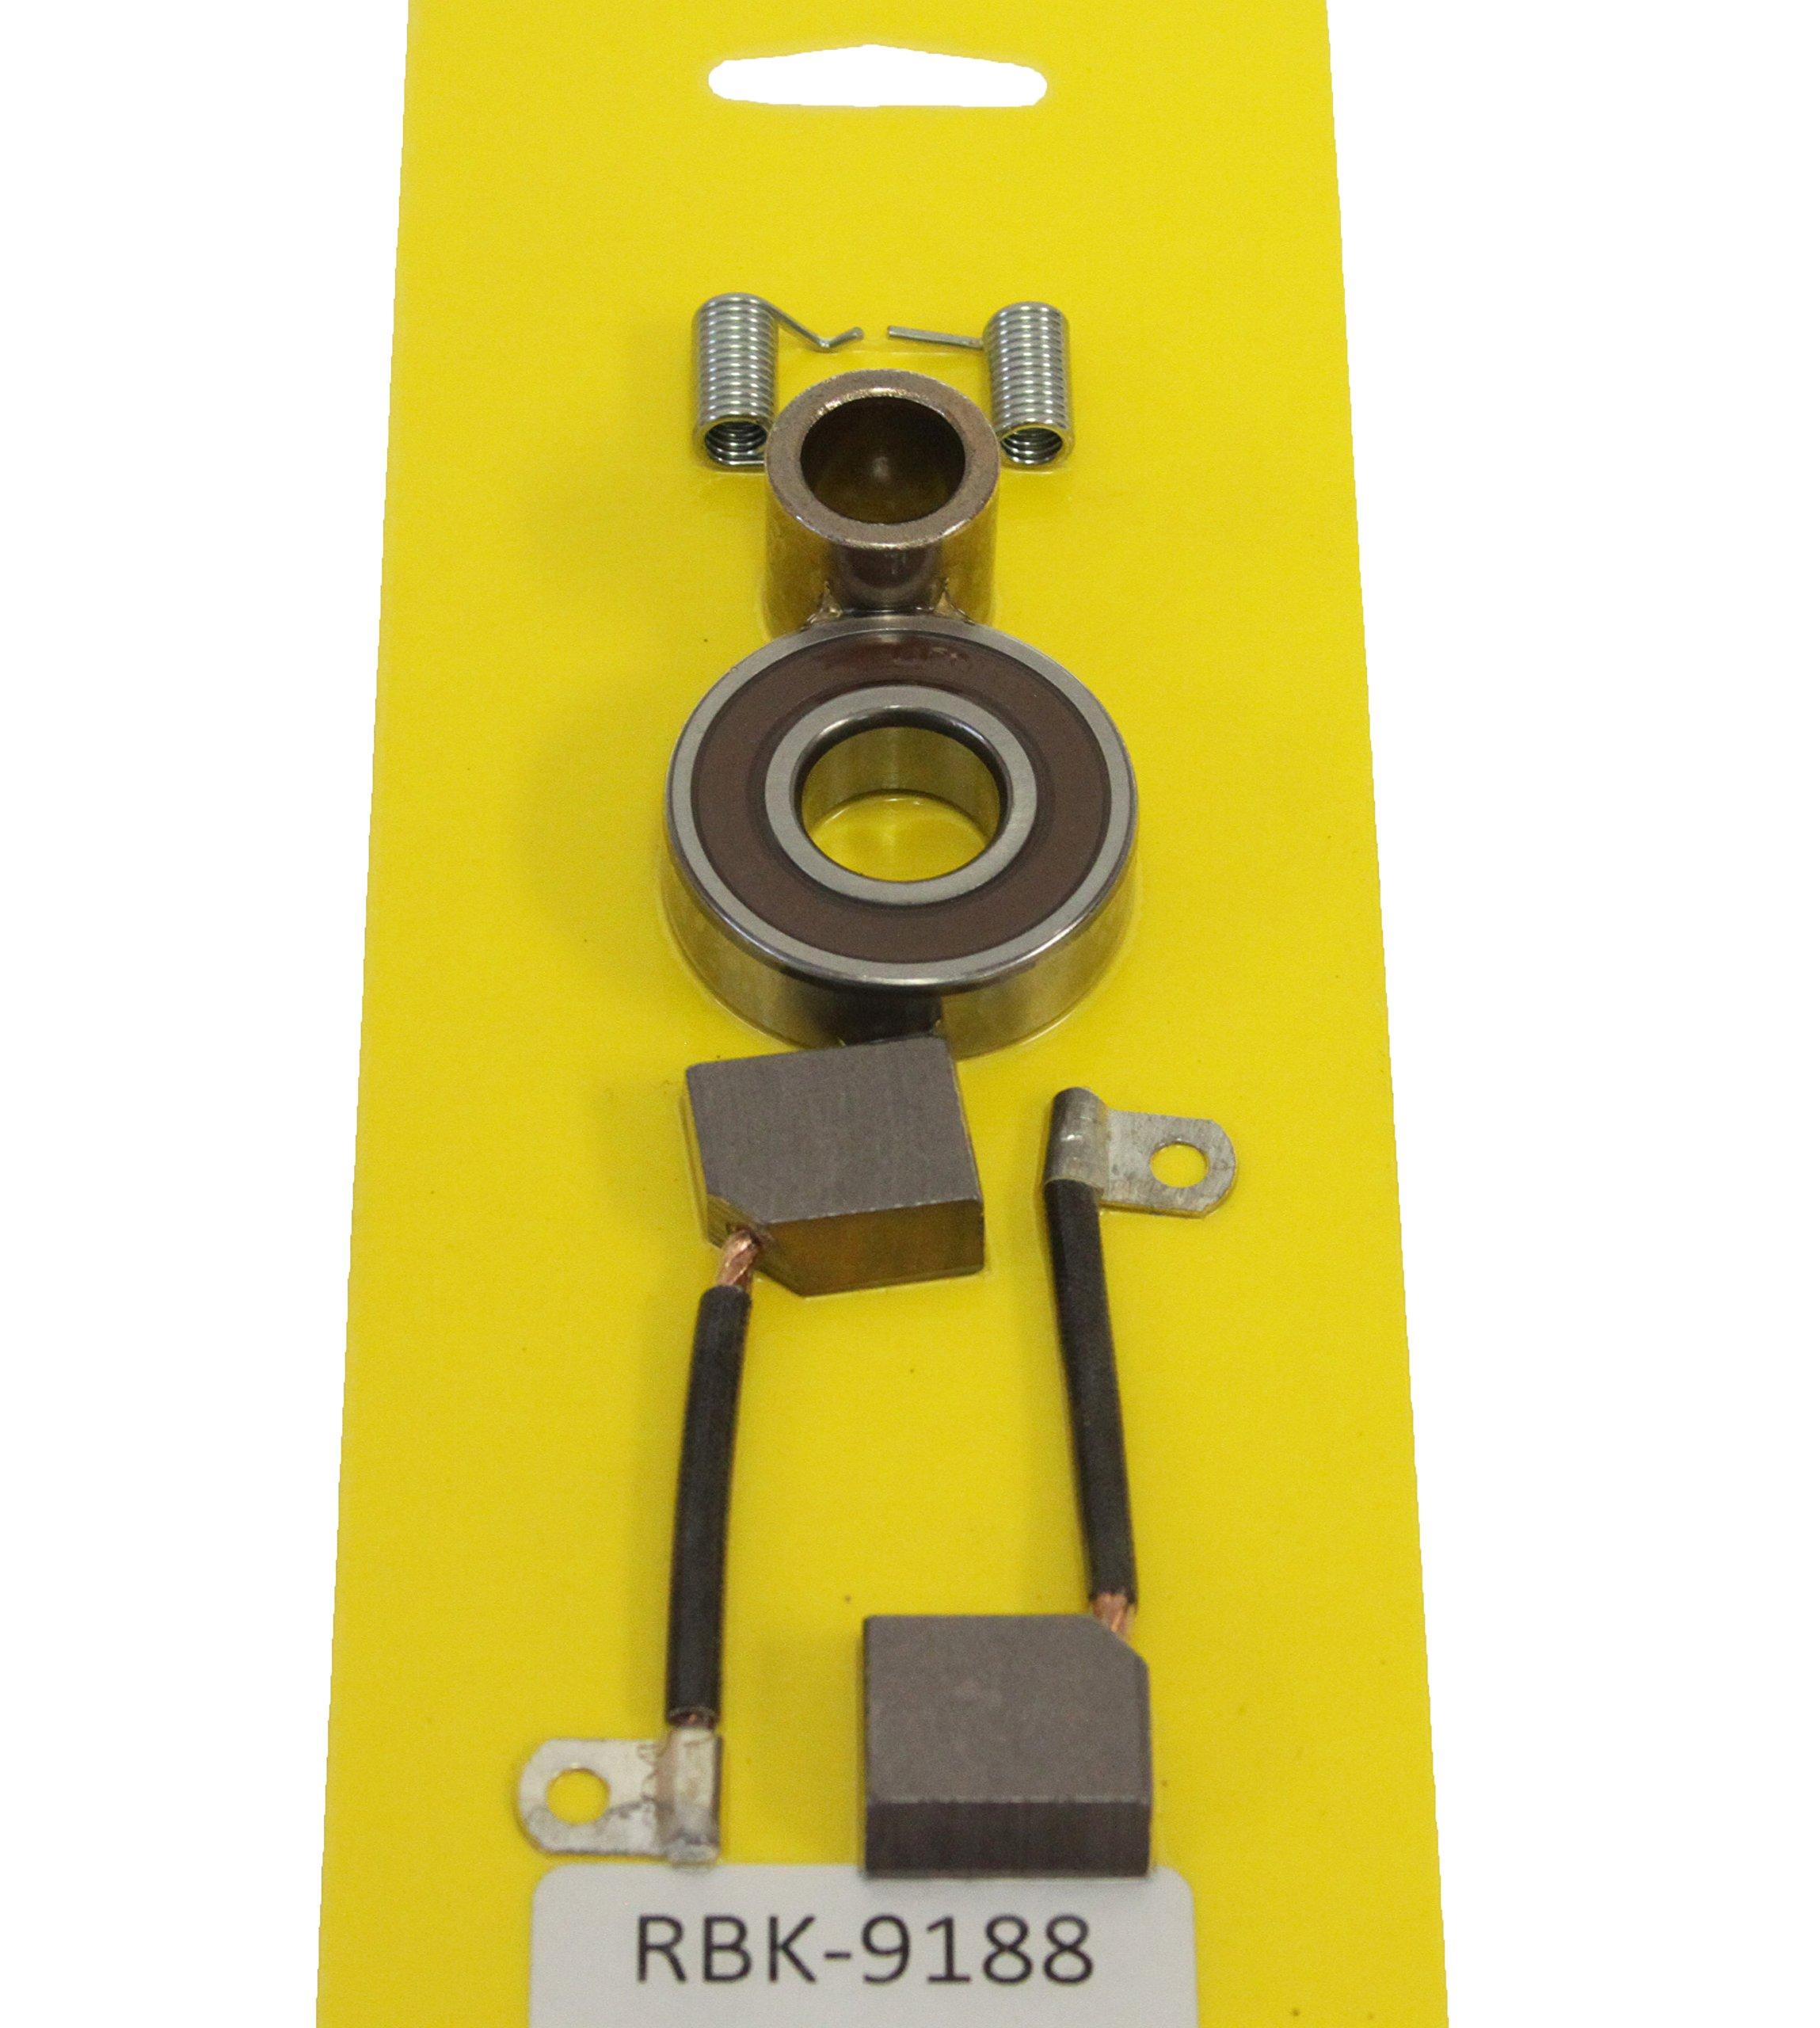 Starter Generator Bolens Wiring Diagram Delco Repair Kit Brushes Bushing Springs Cub Cadet Bolens1101432 1101689